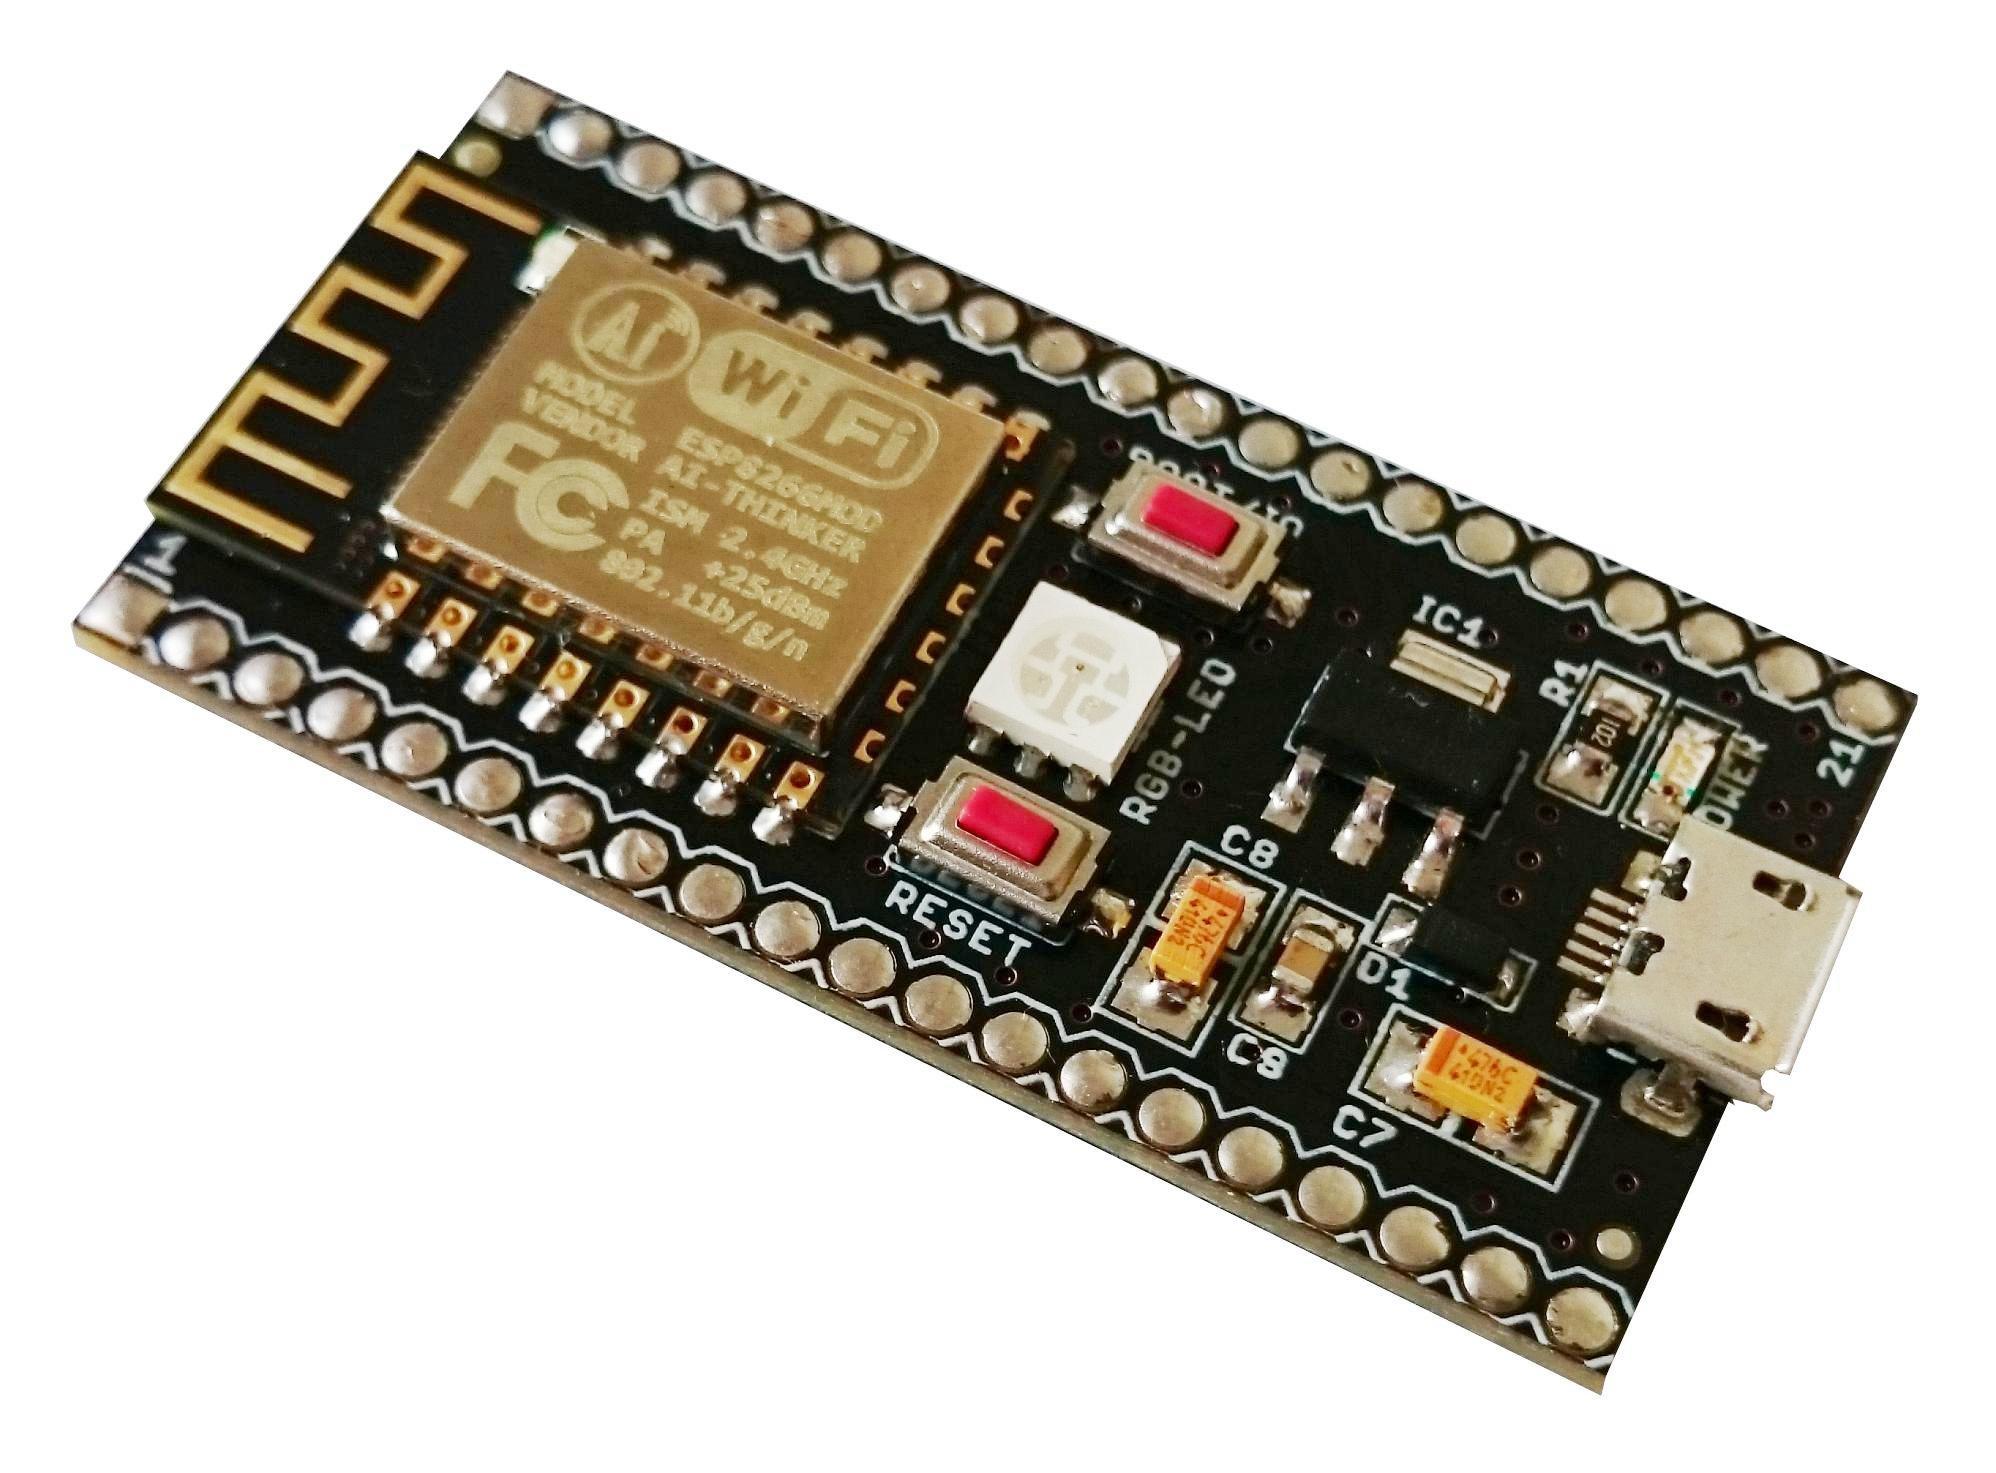 Esp8266 Based Smartwifi Development Module From Knewron On Tindie